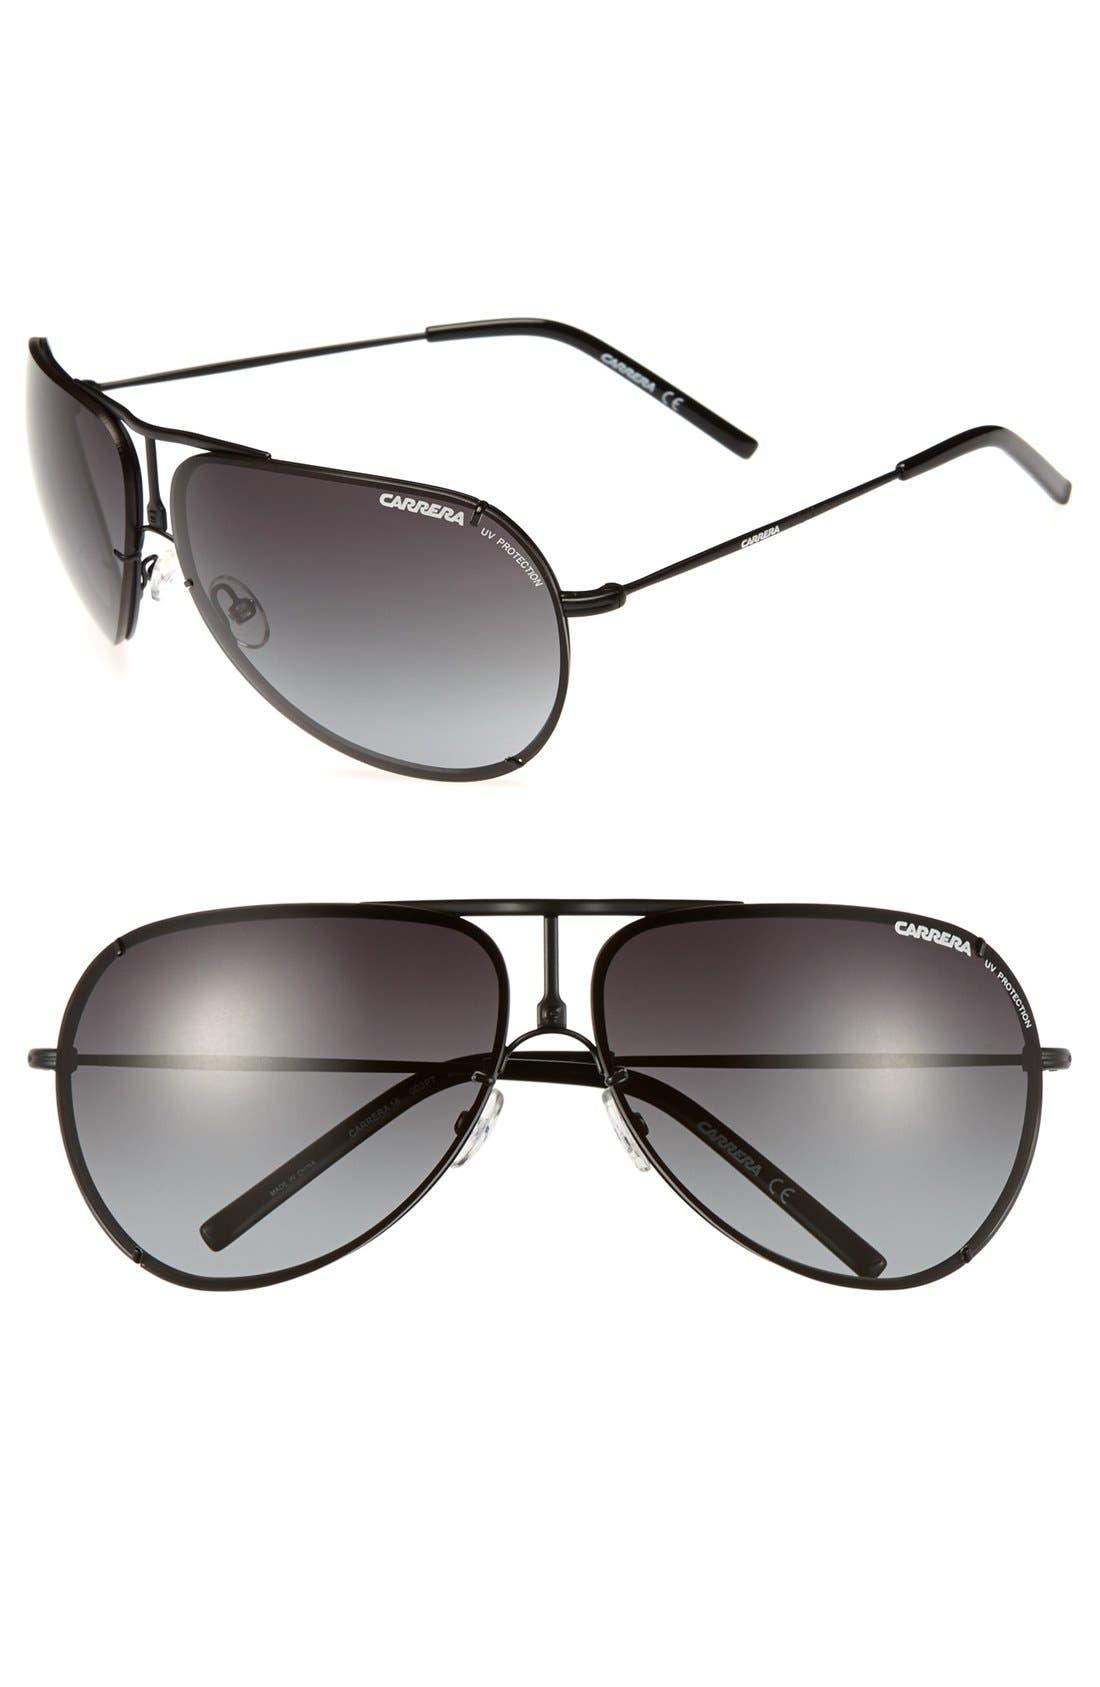 Main Image - Carrera Eyewear 67mm Aviator Sunglasses